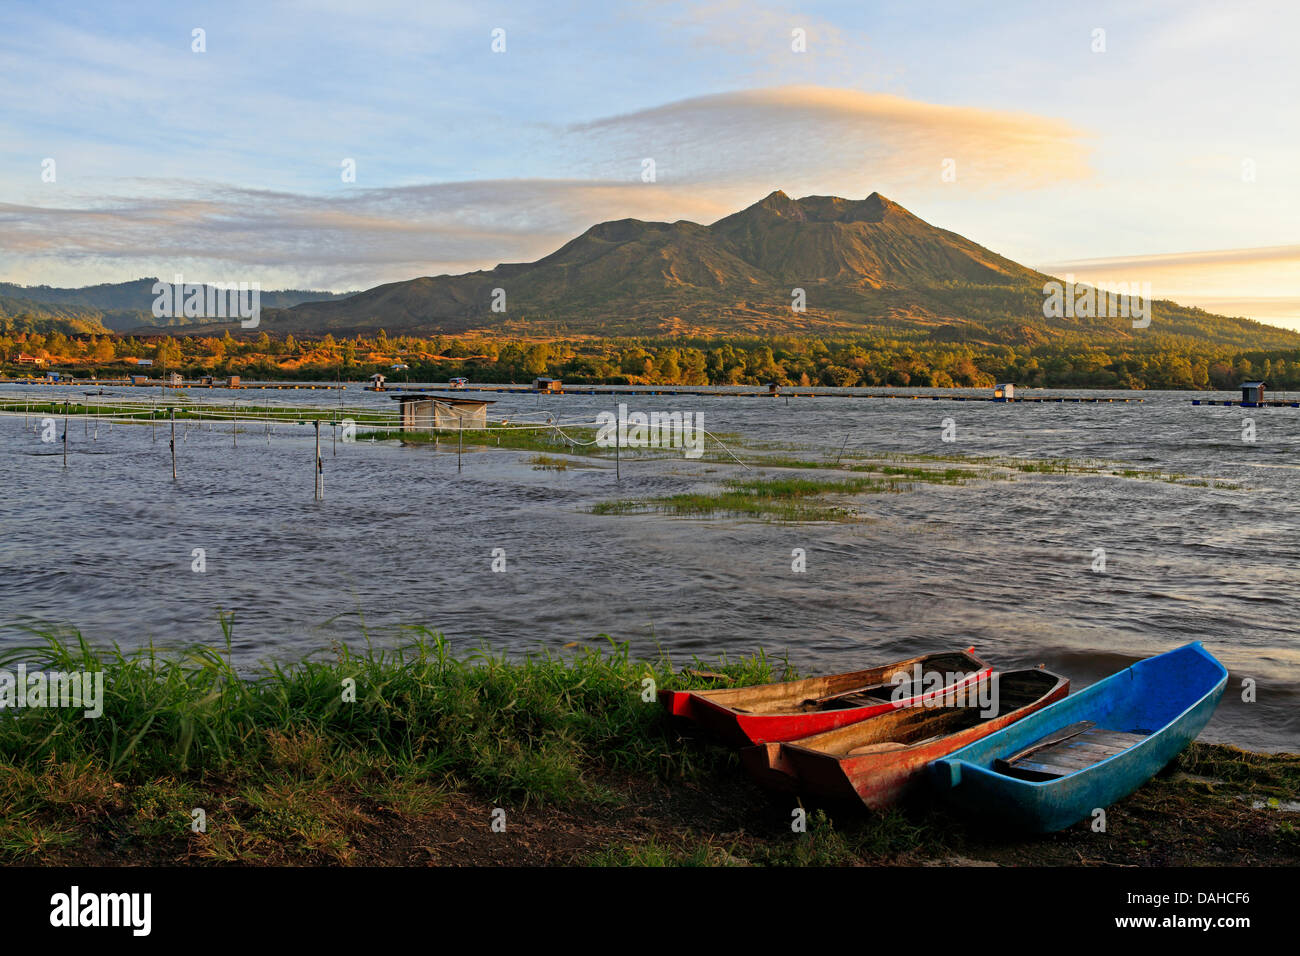 mount-batur-volcano-overlooking-lake-batur-at-sunrise-with-wooden-DAHCF6.jpg